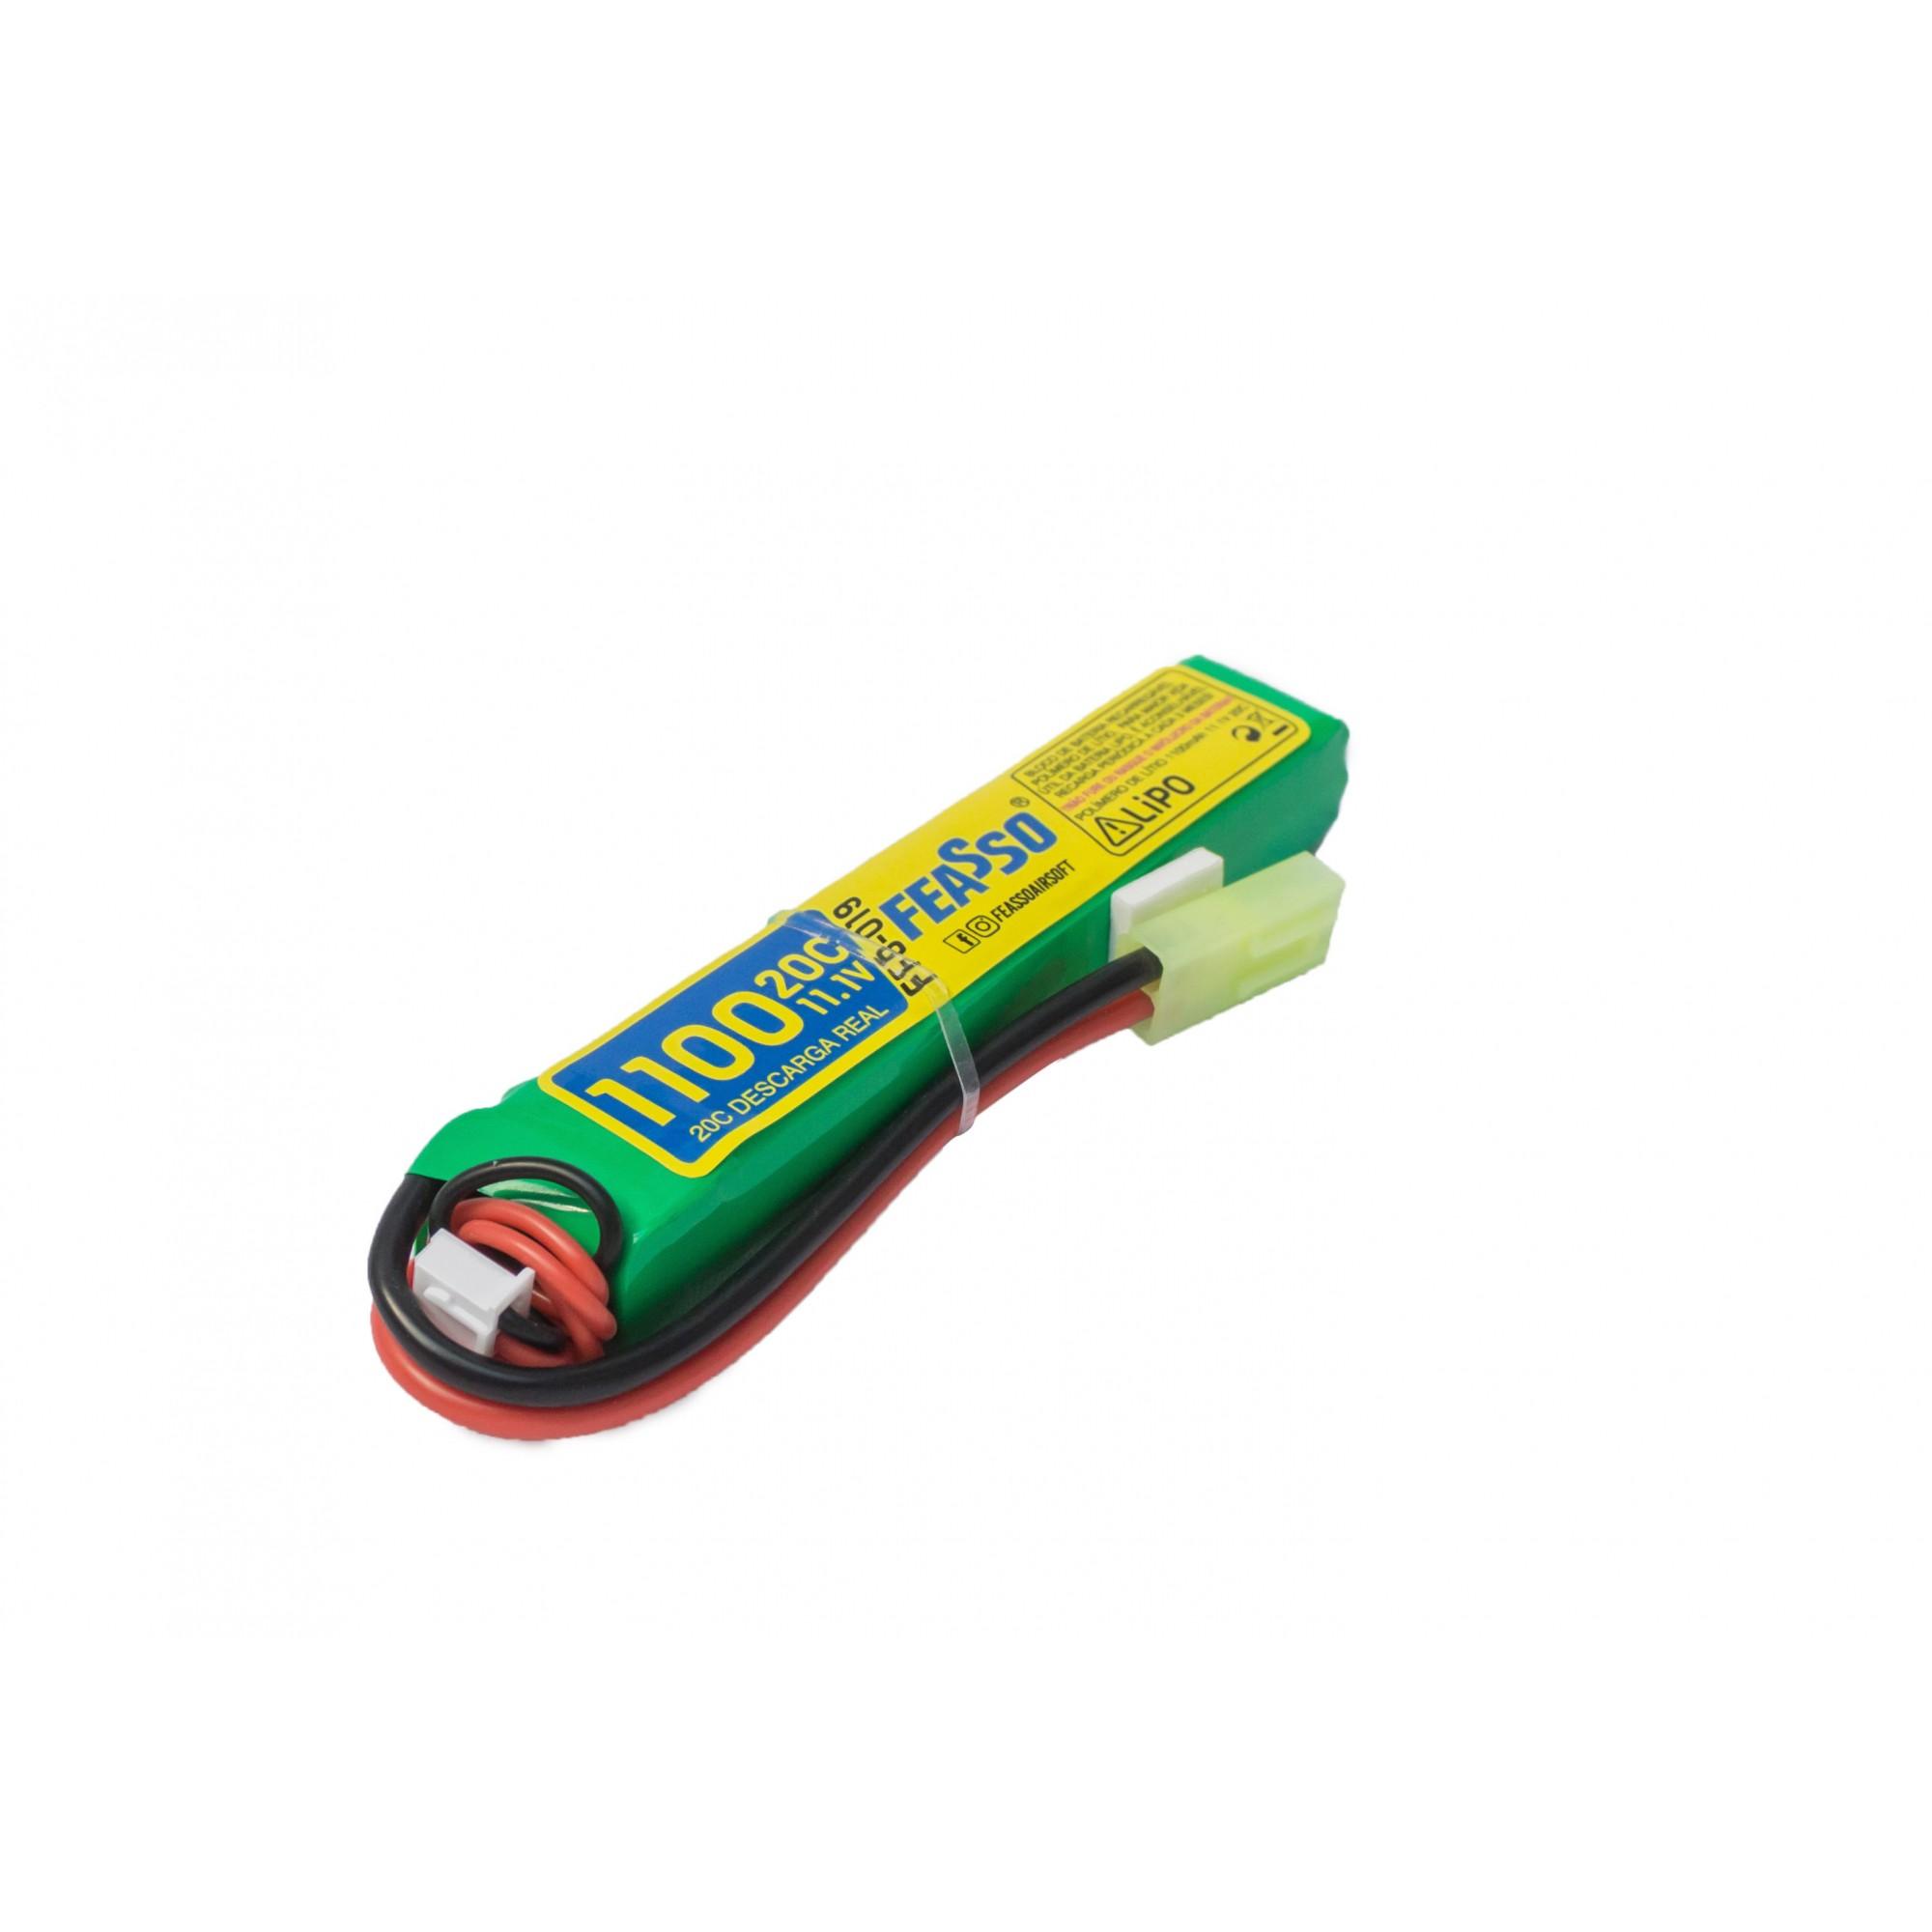 Bateria Lipo Para Airsoft 11.1v 1100mah 20c Ffb-019